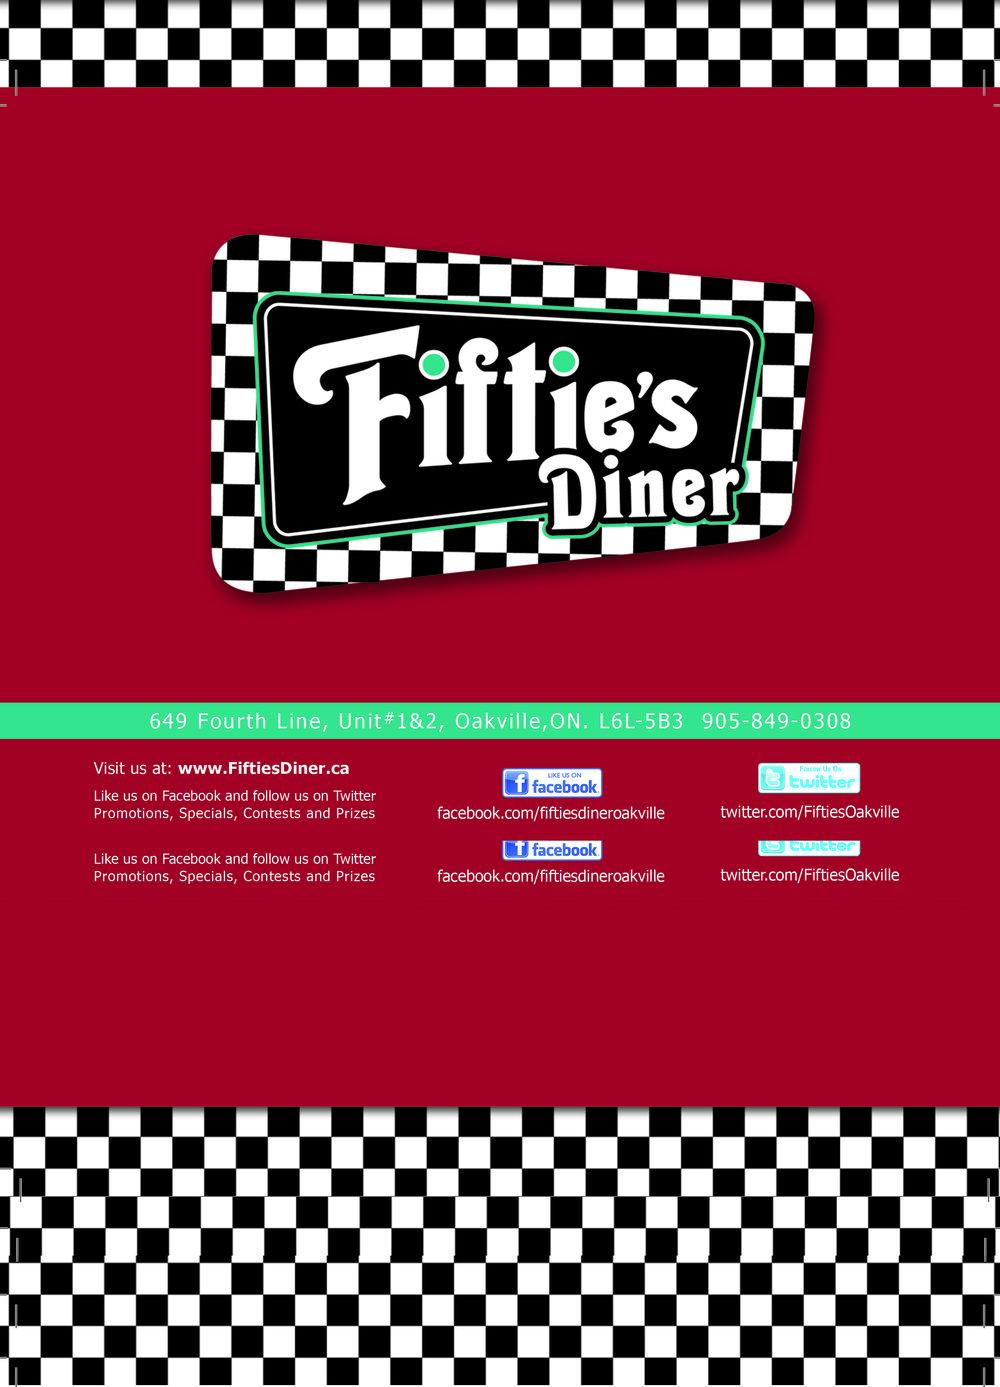 Fifties Diner logo for website (1).jpg